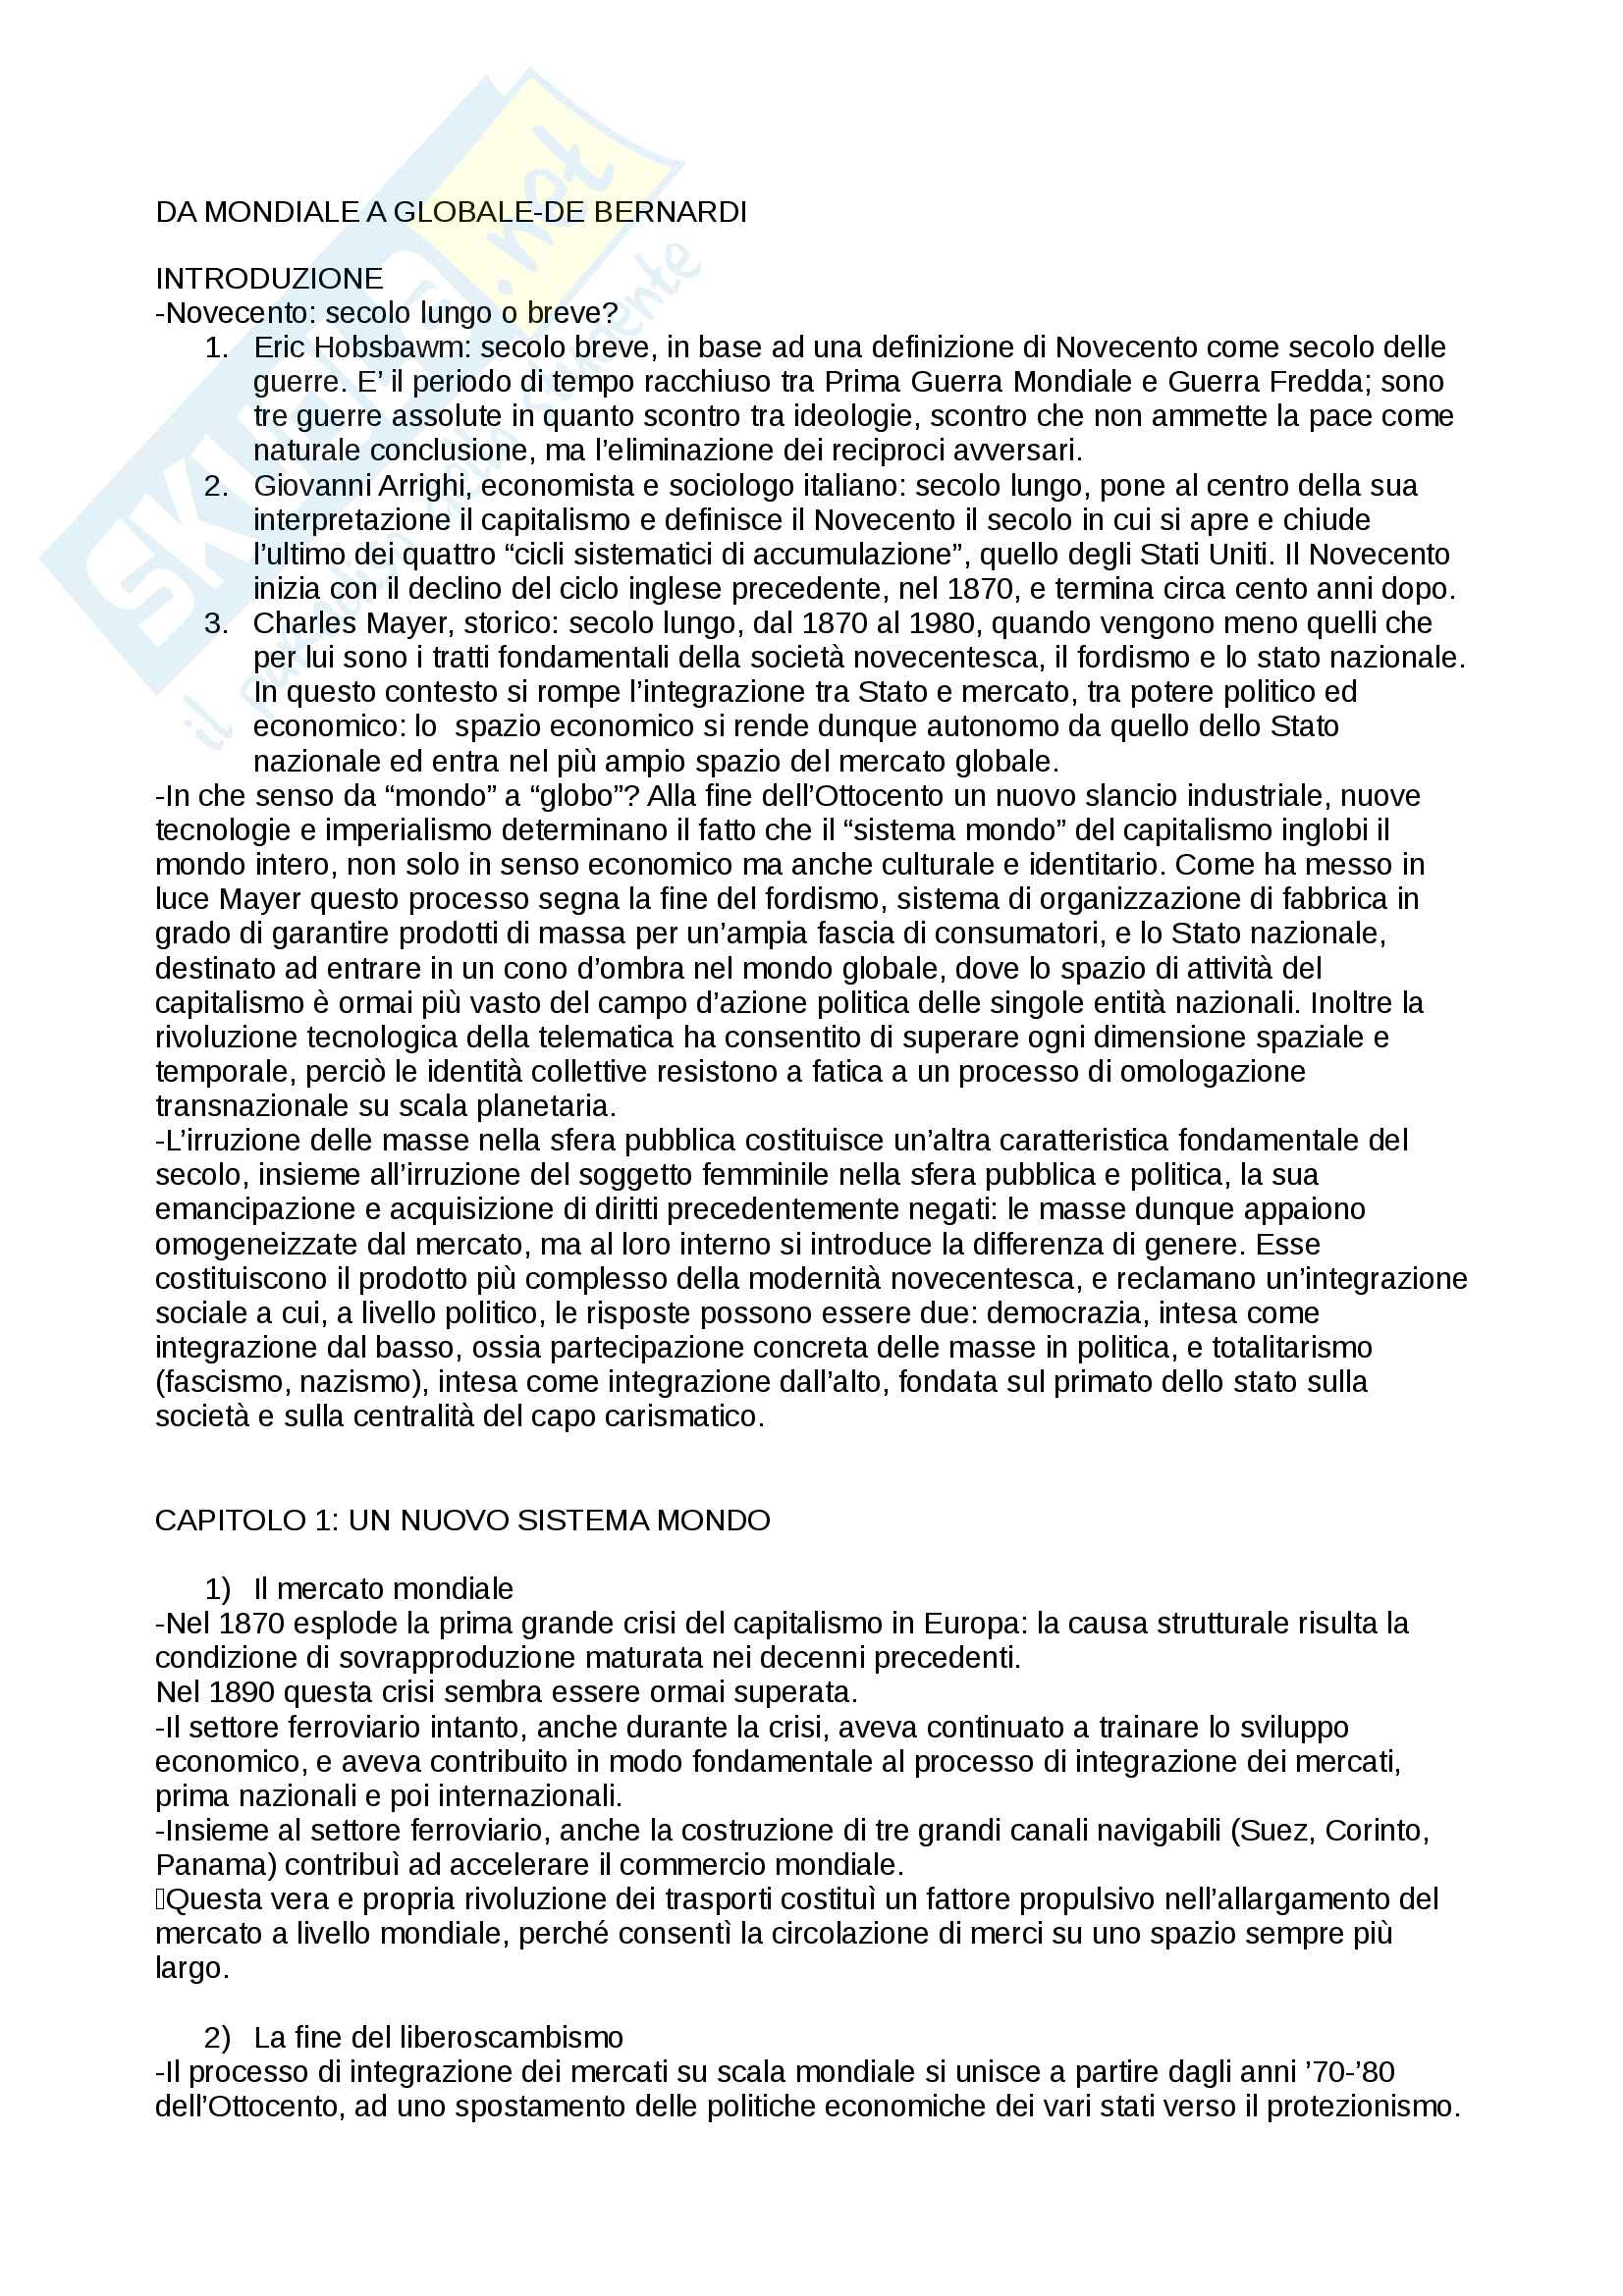 Riassunto esame storia contemporanea, prof. Calanca, libro consigliato Da mondiale a globale, Storia del xx secolo, Alberto De Bernardi